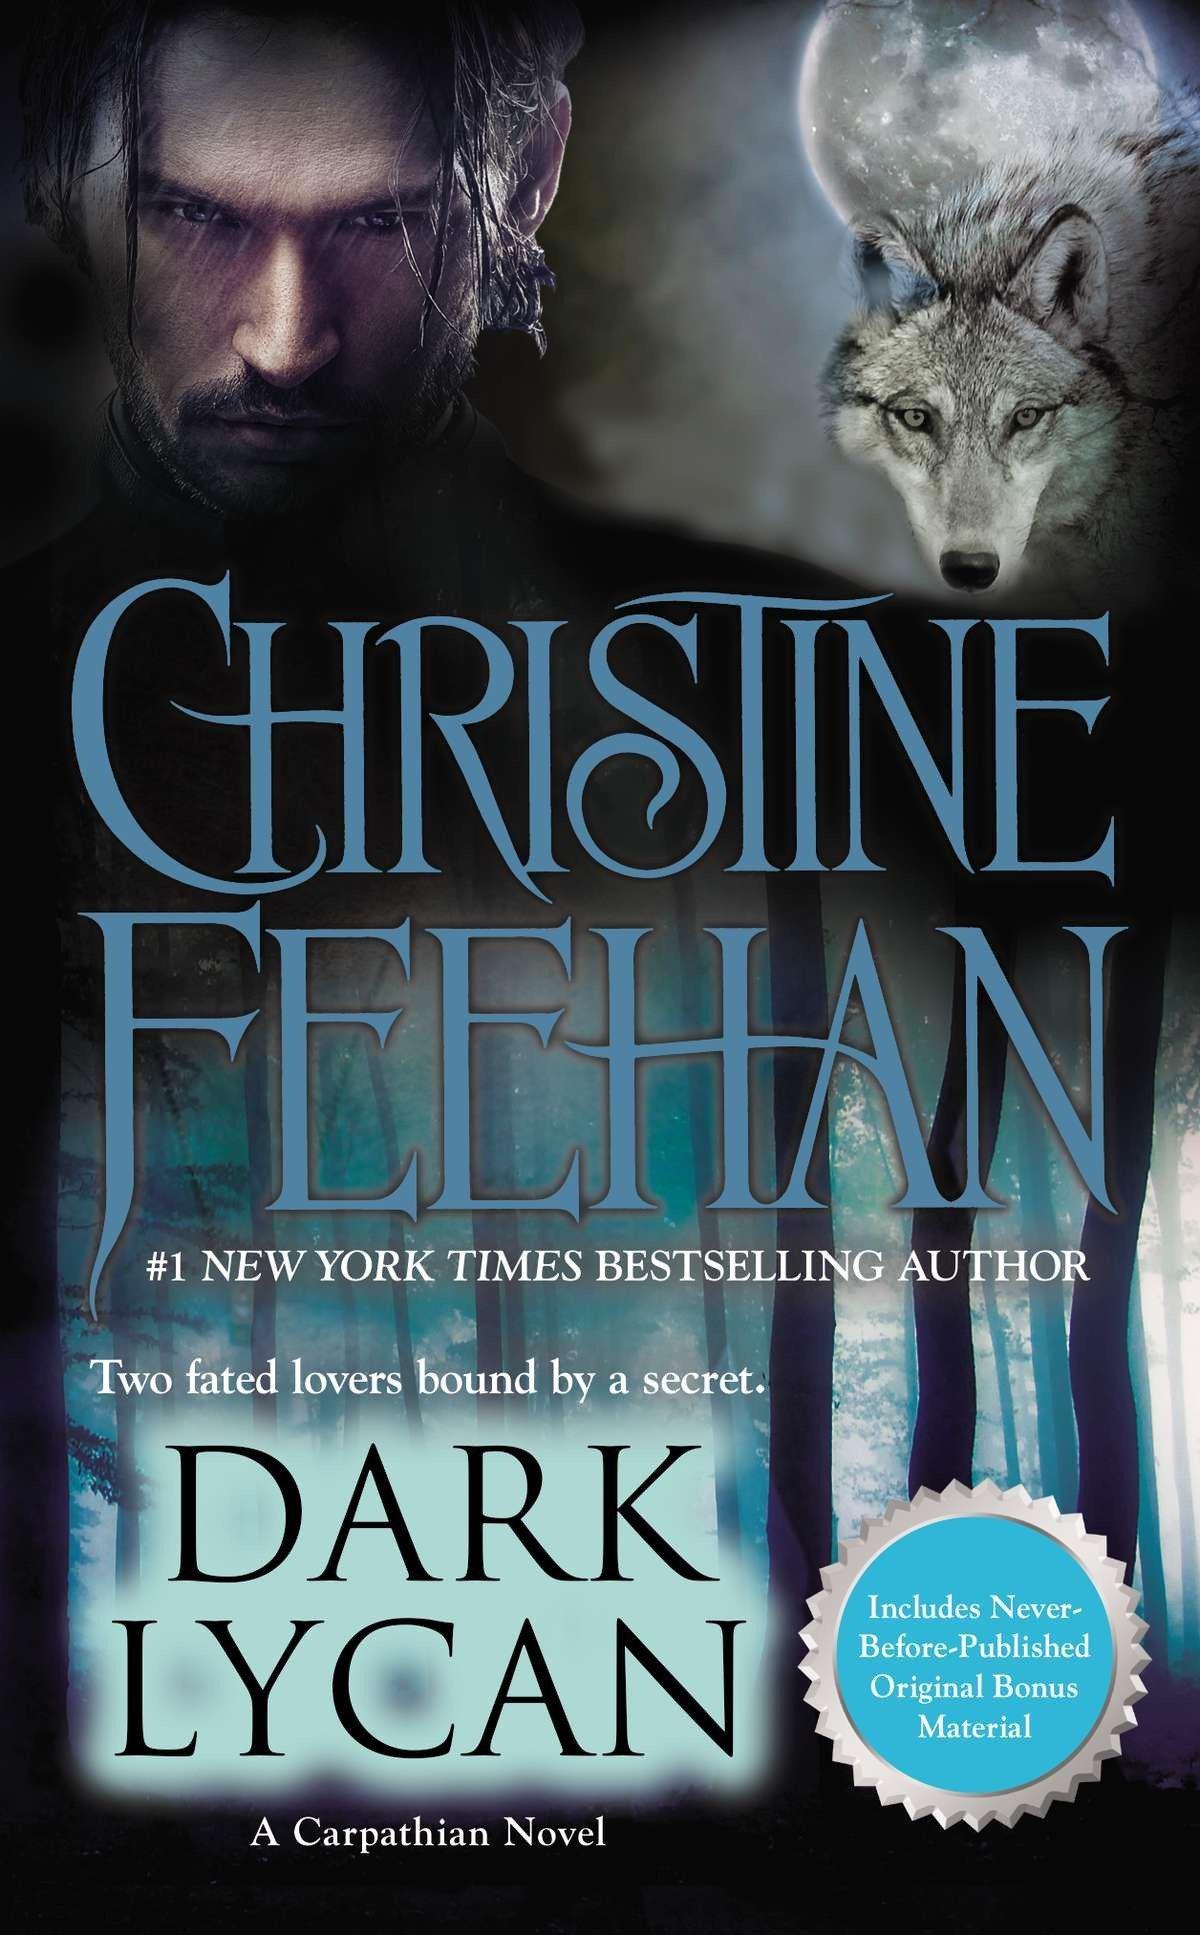 Dark Lycan Carpathian Novel A Christine Feehan 9780515154238